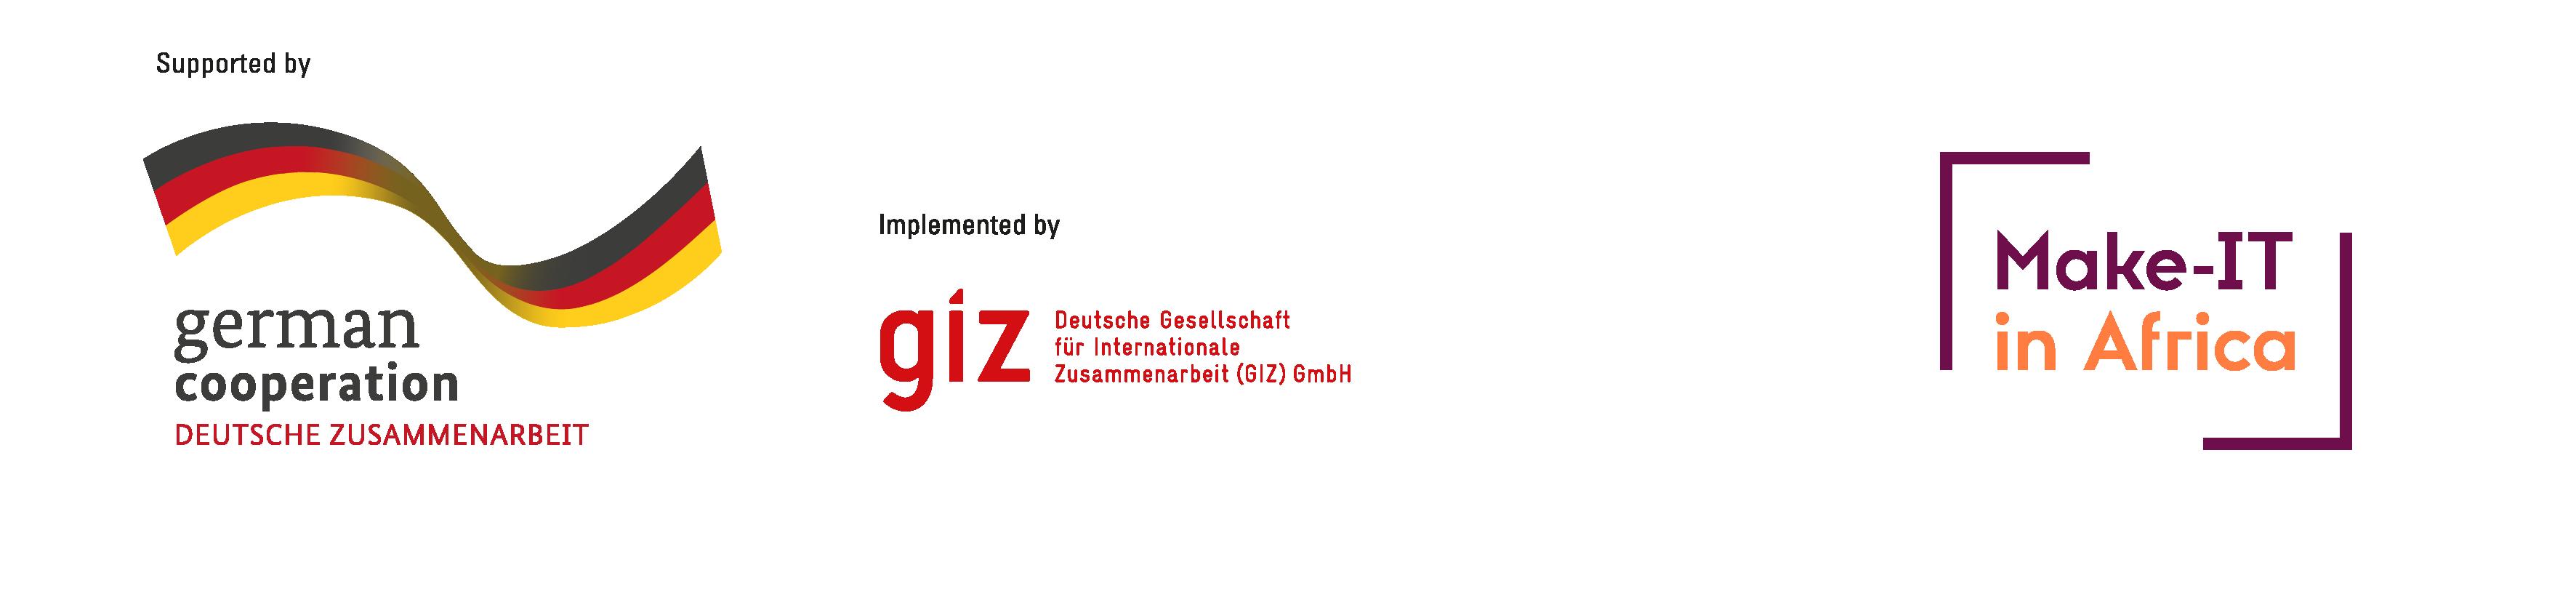 GIZ Make-IT